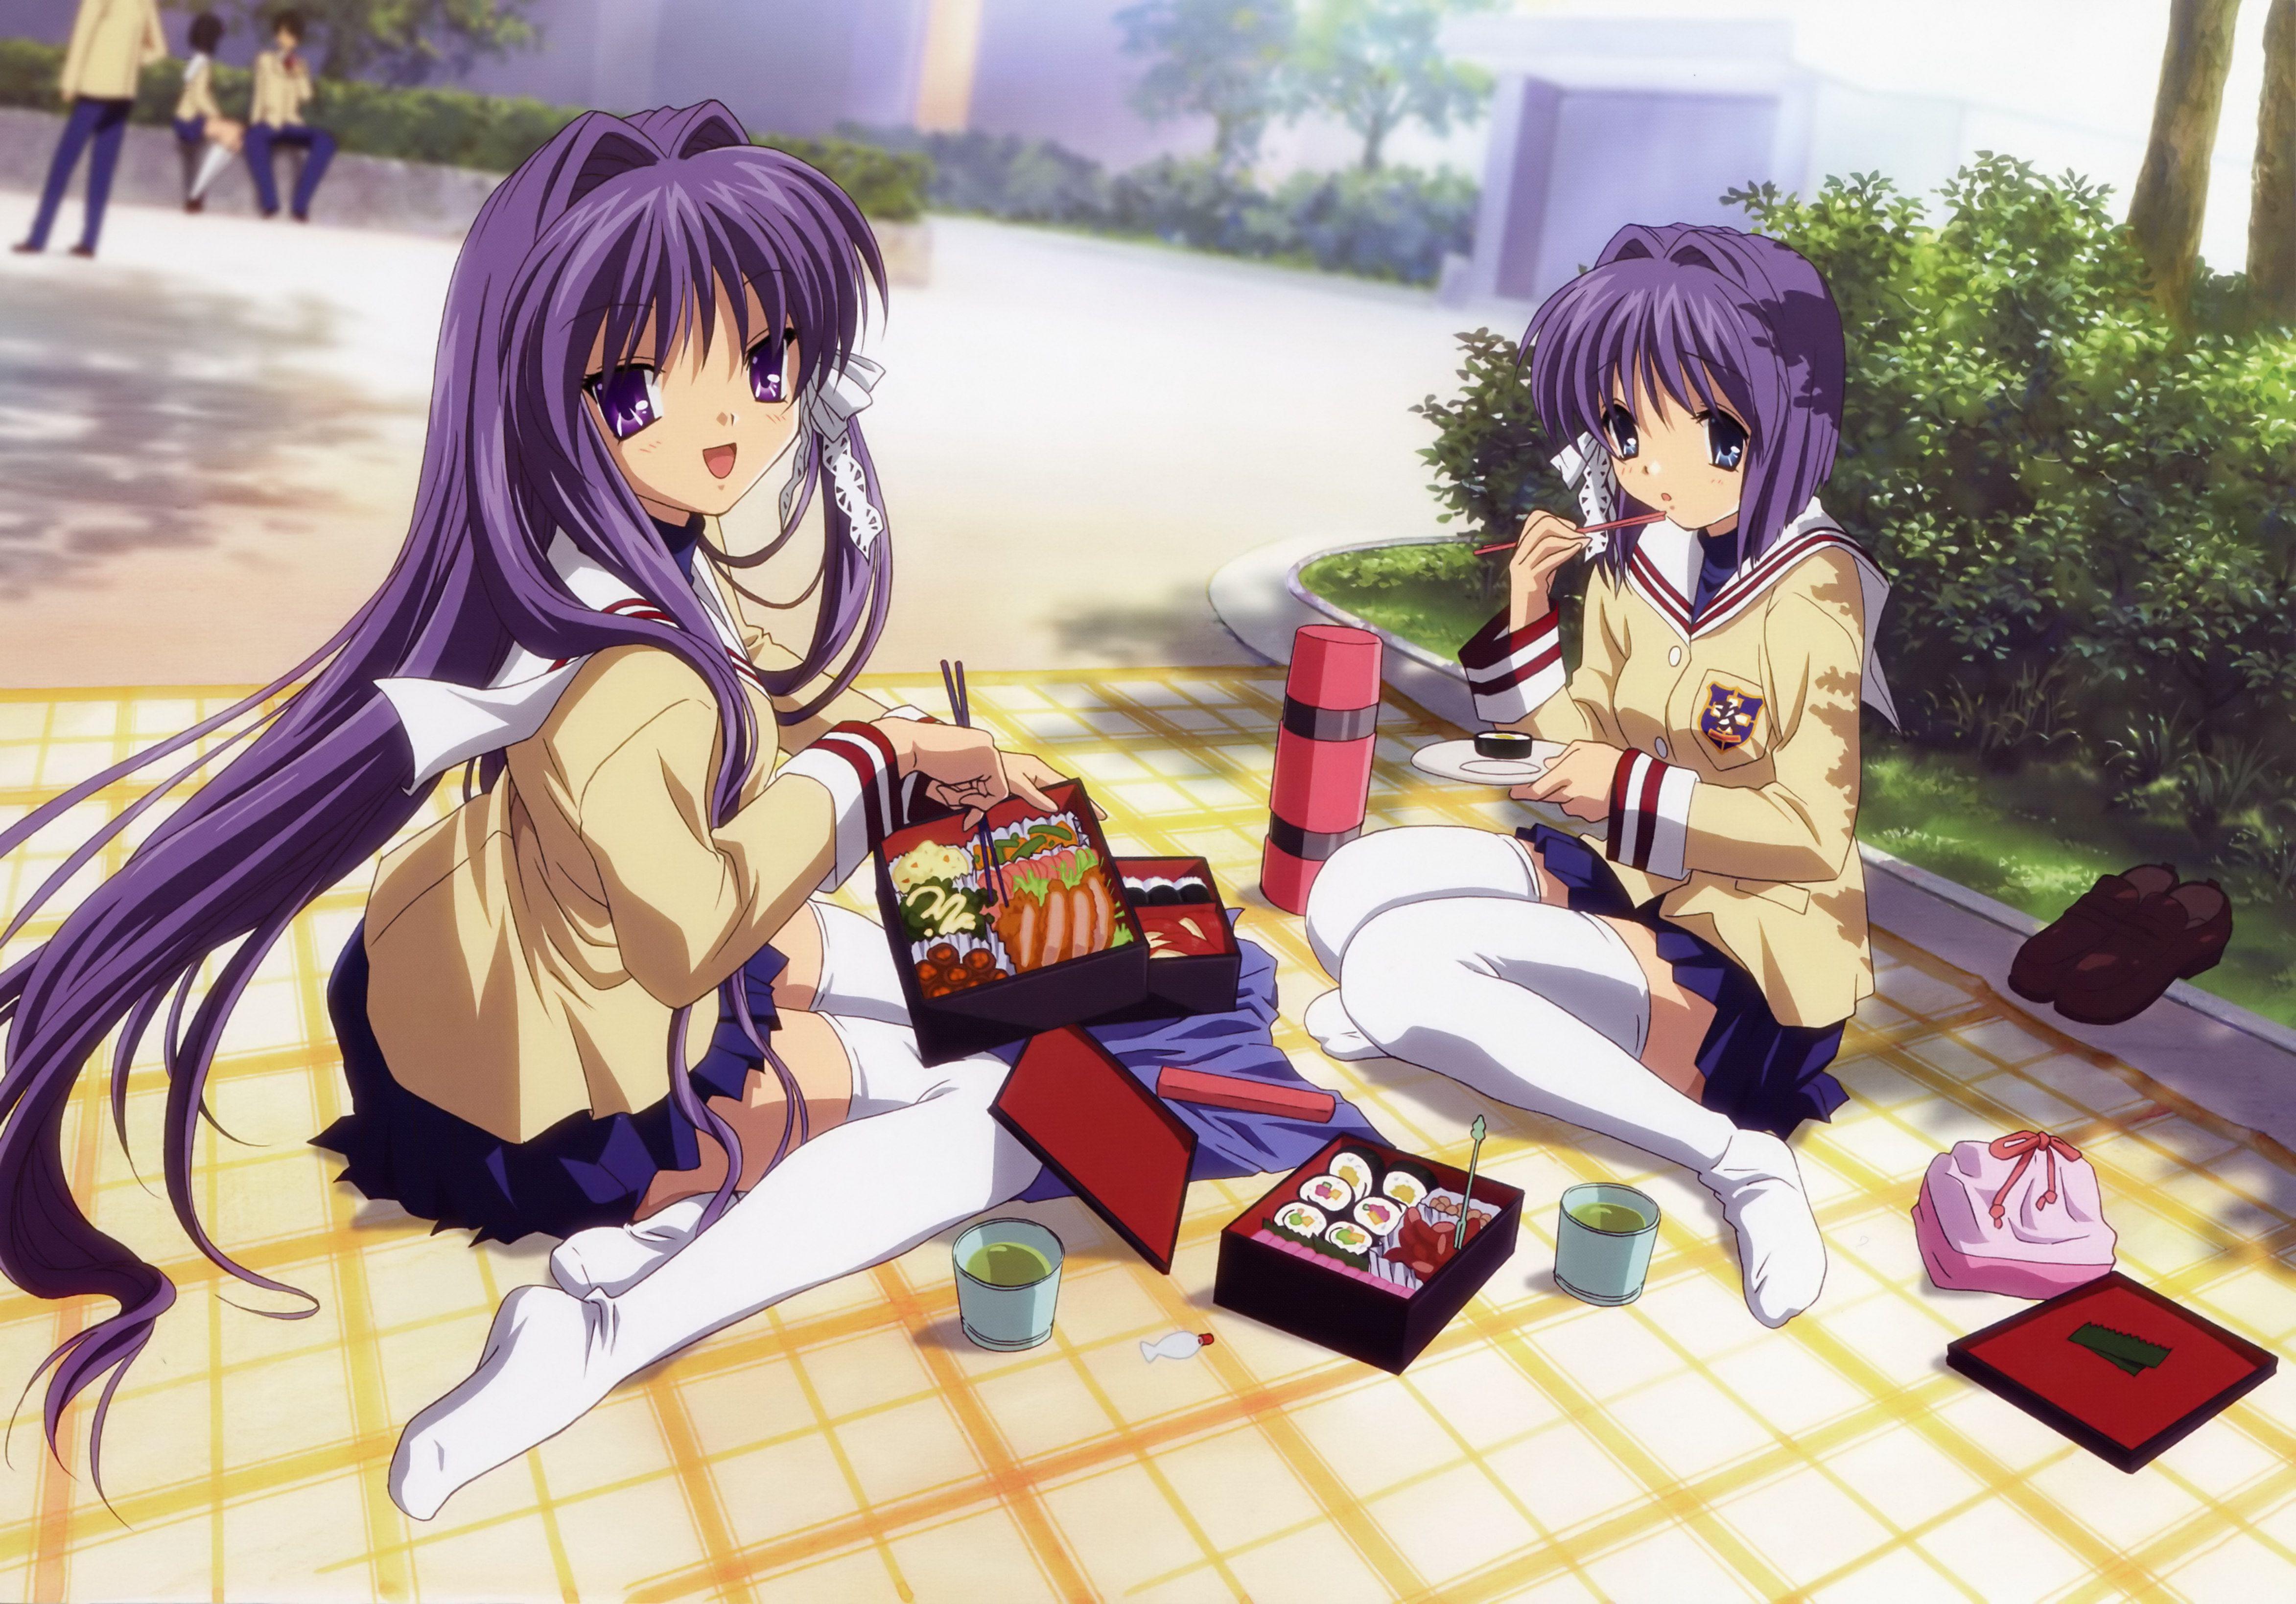 Clannad Hd Wallpapers Clannad Clannad Anime Anime